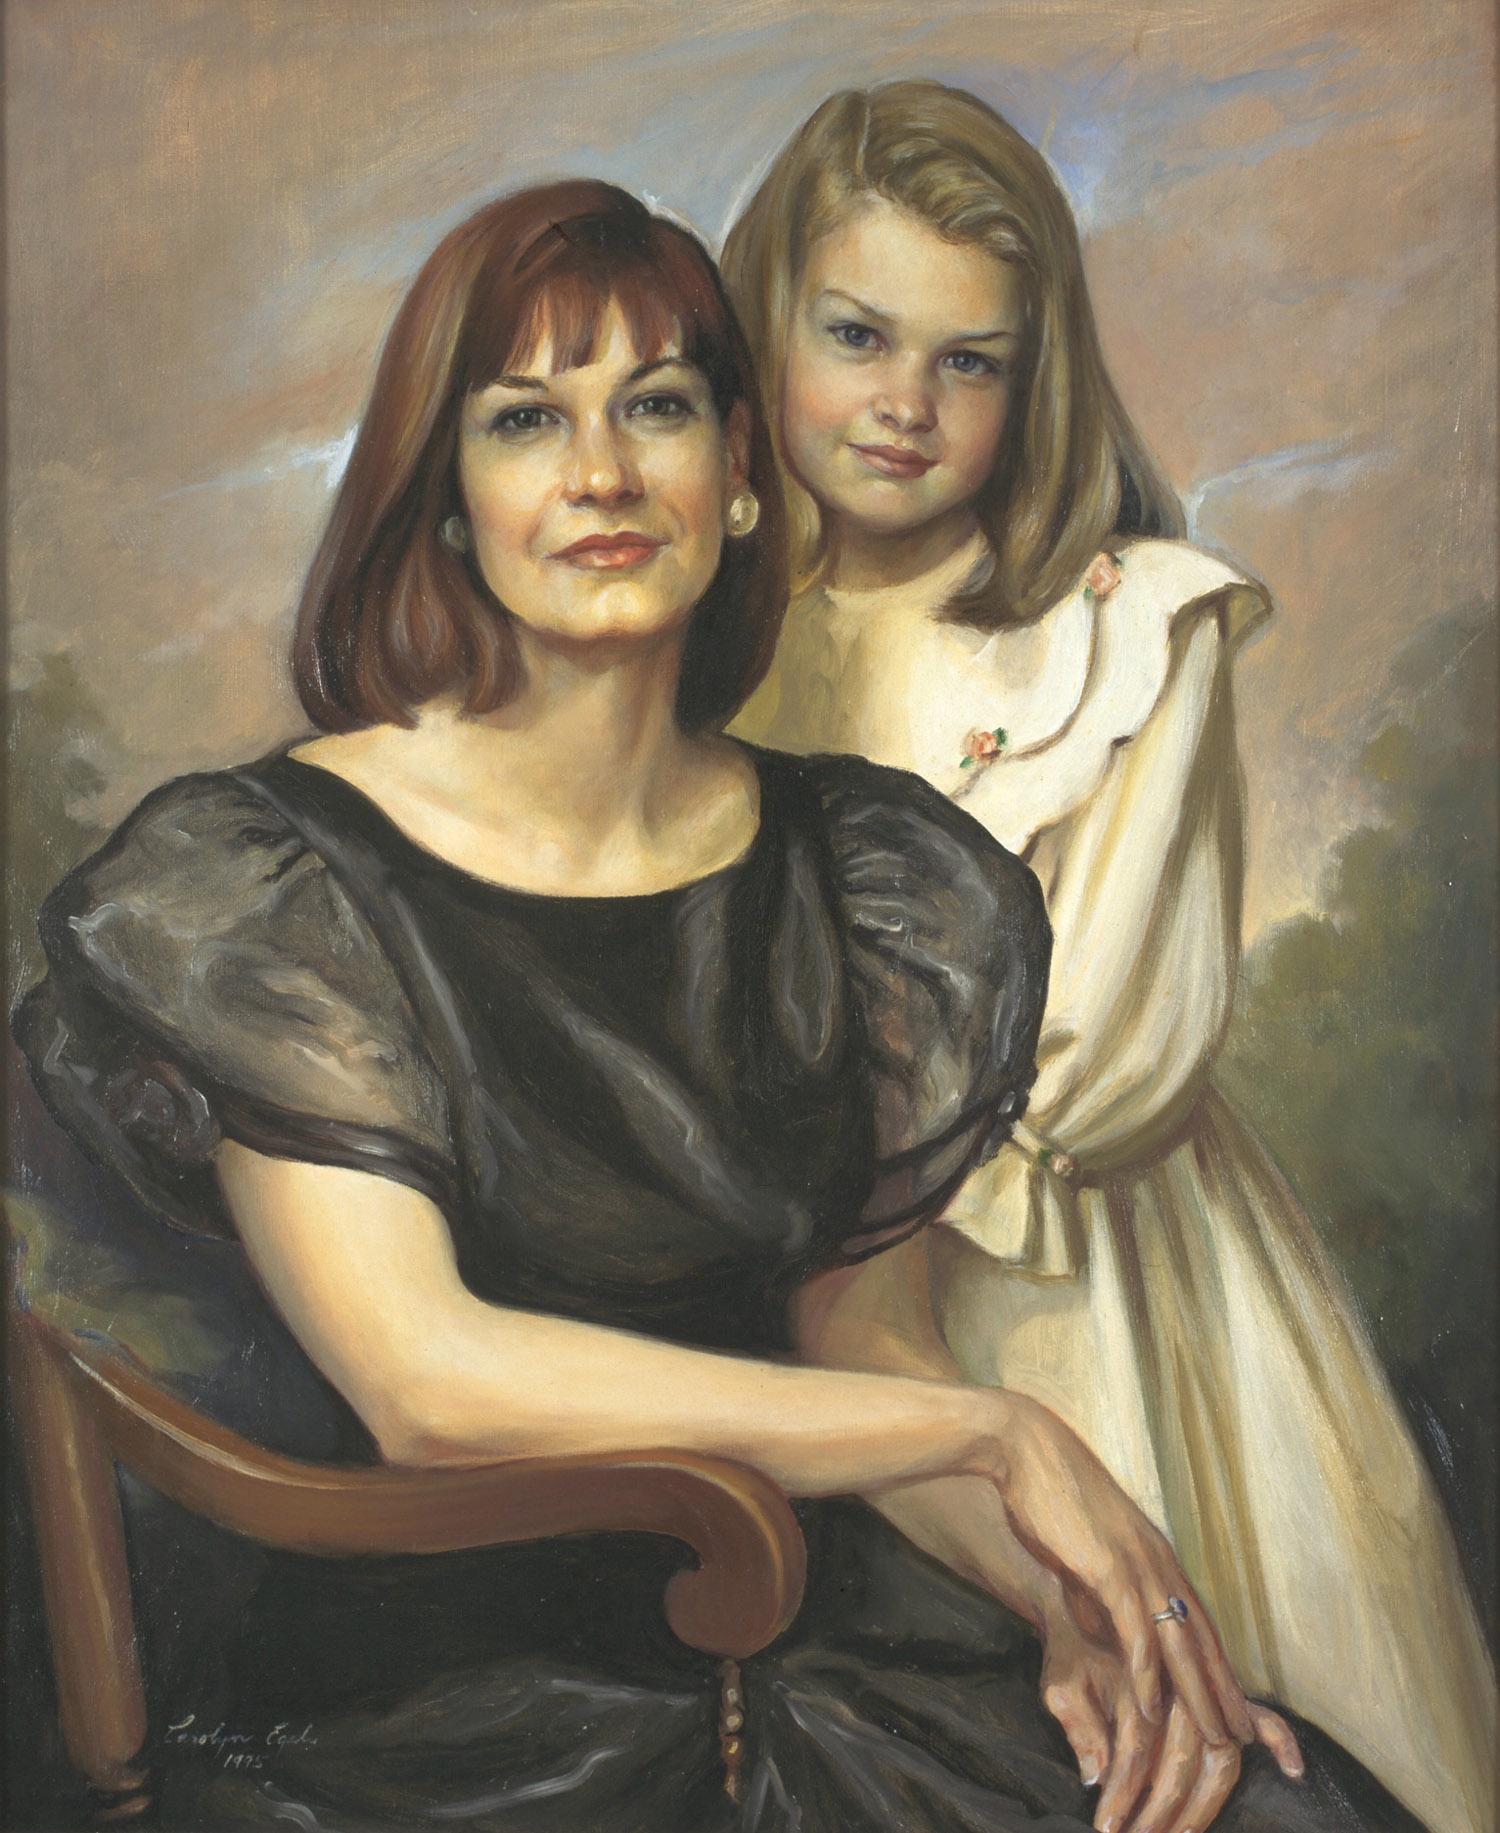 "Andrea Rousseaux and Amalie, 32"" x 38"". Commission."